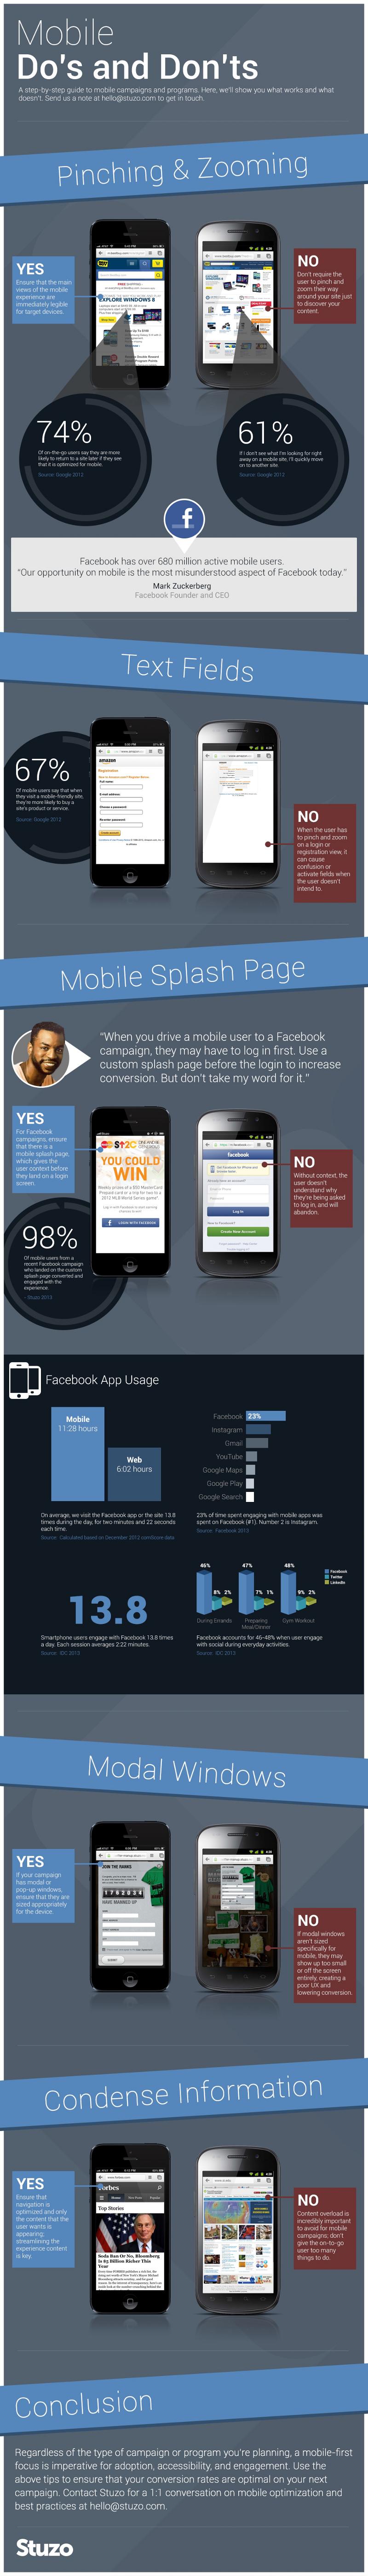 Facebook-Mobile-Advertising